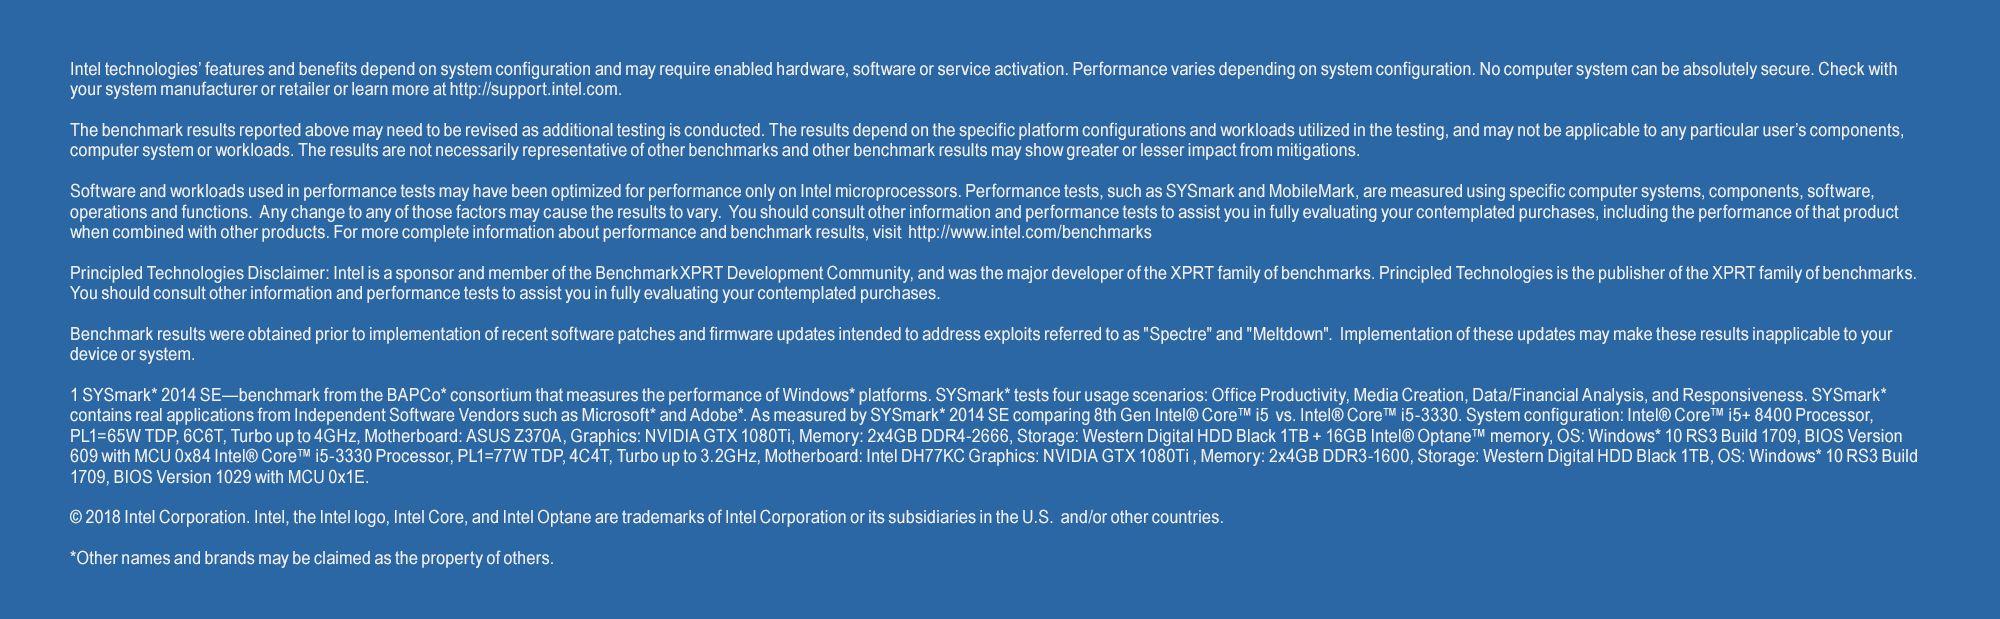 Intel Core i5-8400 Coffee Lake 6-Core 2 8 GHz (4 0 GHz Turbo) LGA 1151 (300  Series) 65W BX80684I58400 Desktop Processor Intel UHD Graphics 630 -